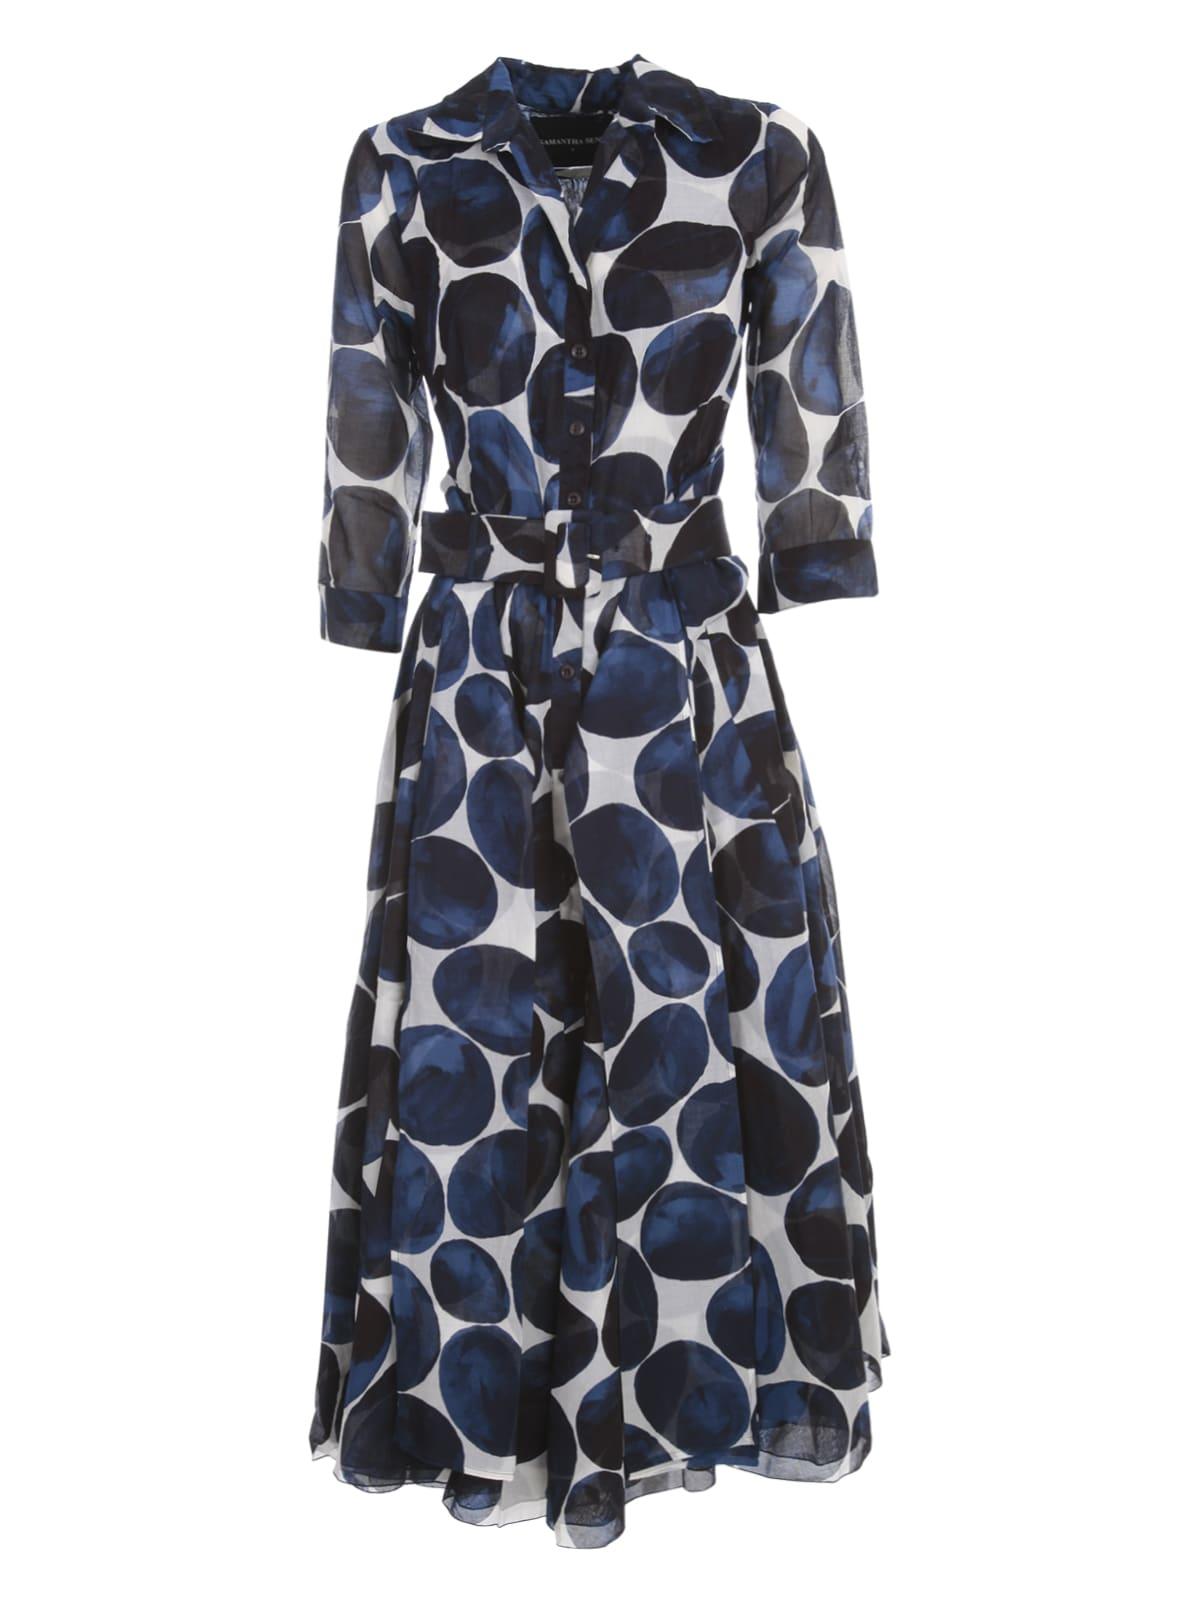 Buy Samantha Sung Aster Musola Midi Dress S/s Boat Neck online, shop Samantha Sung with free shipping